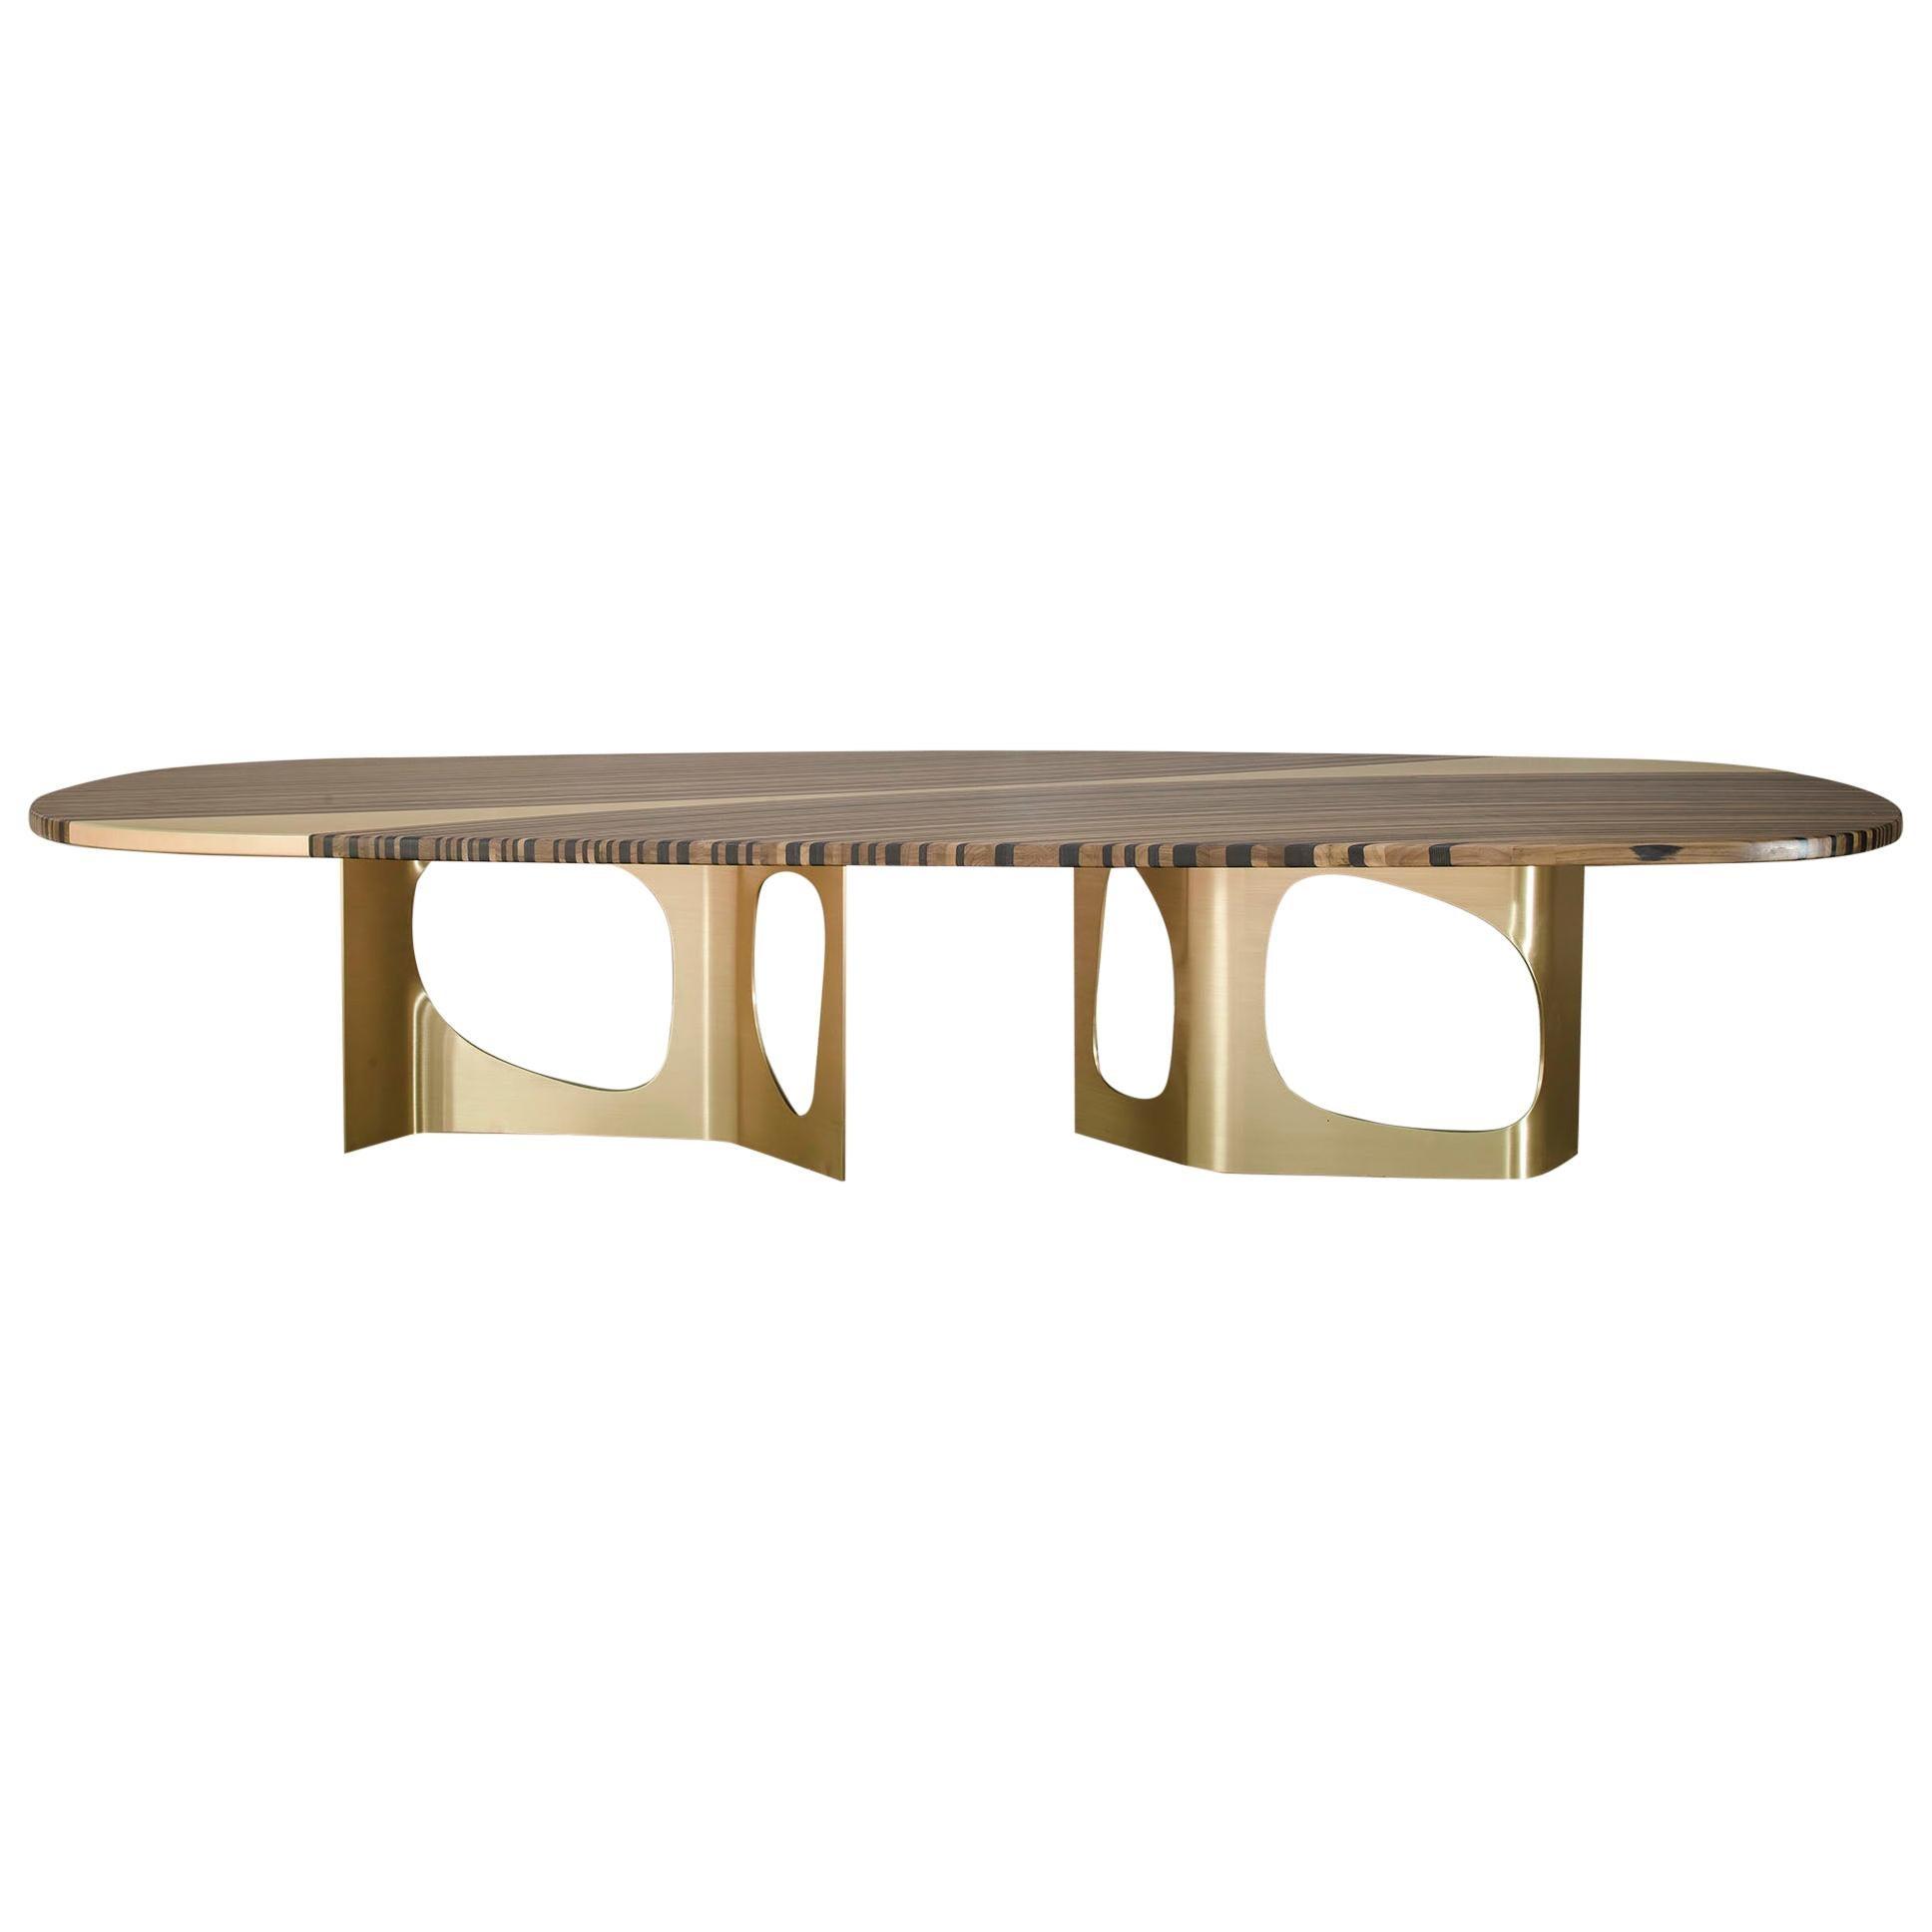 Infinity, StudioManda, Dining Table, Wood Top, Brass Inlay, Brass, Lebanon 2018